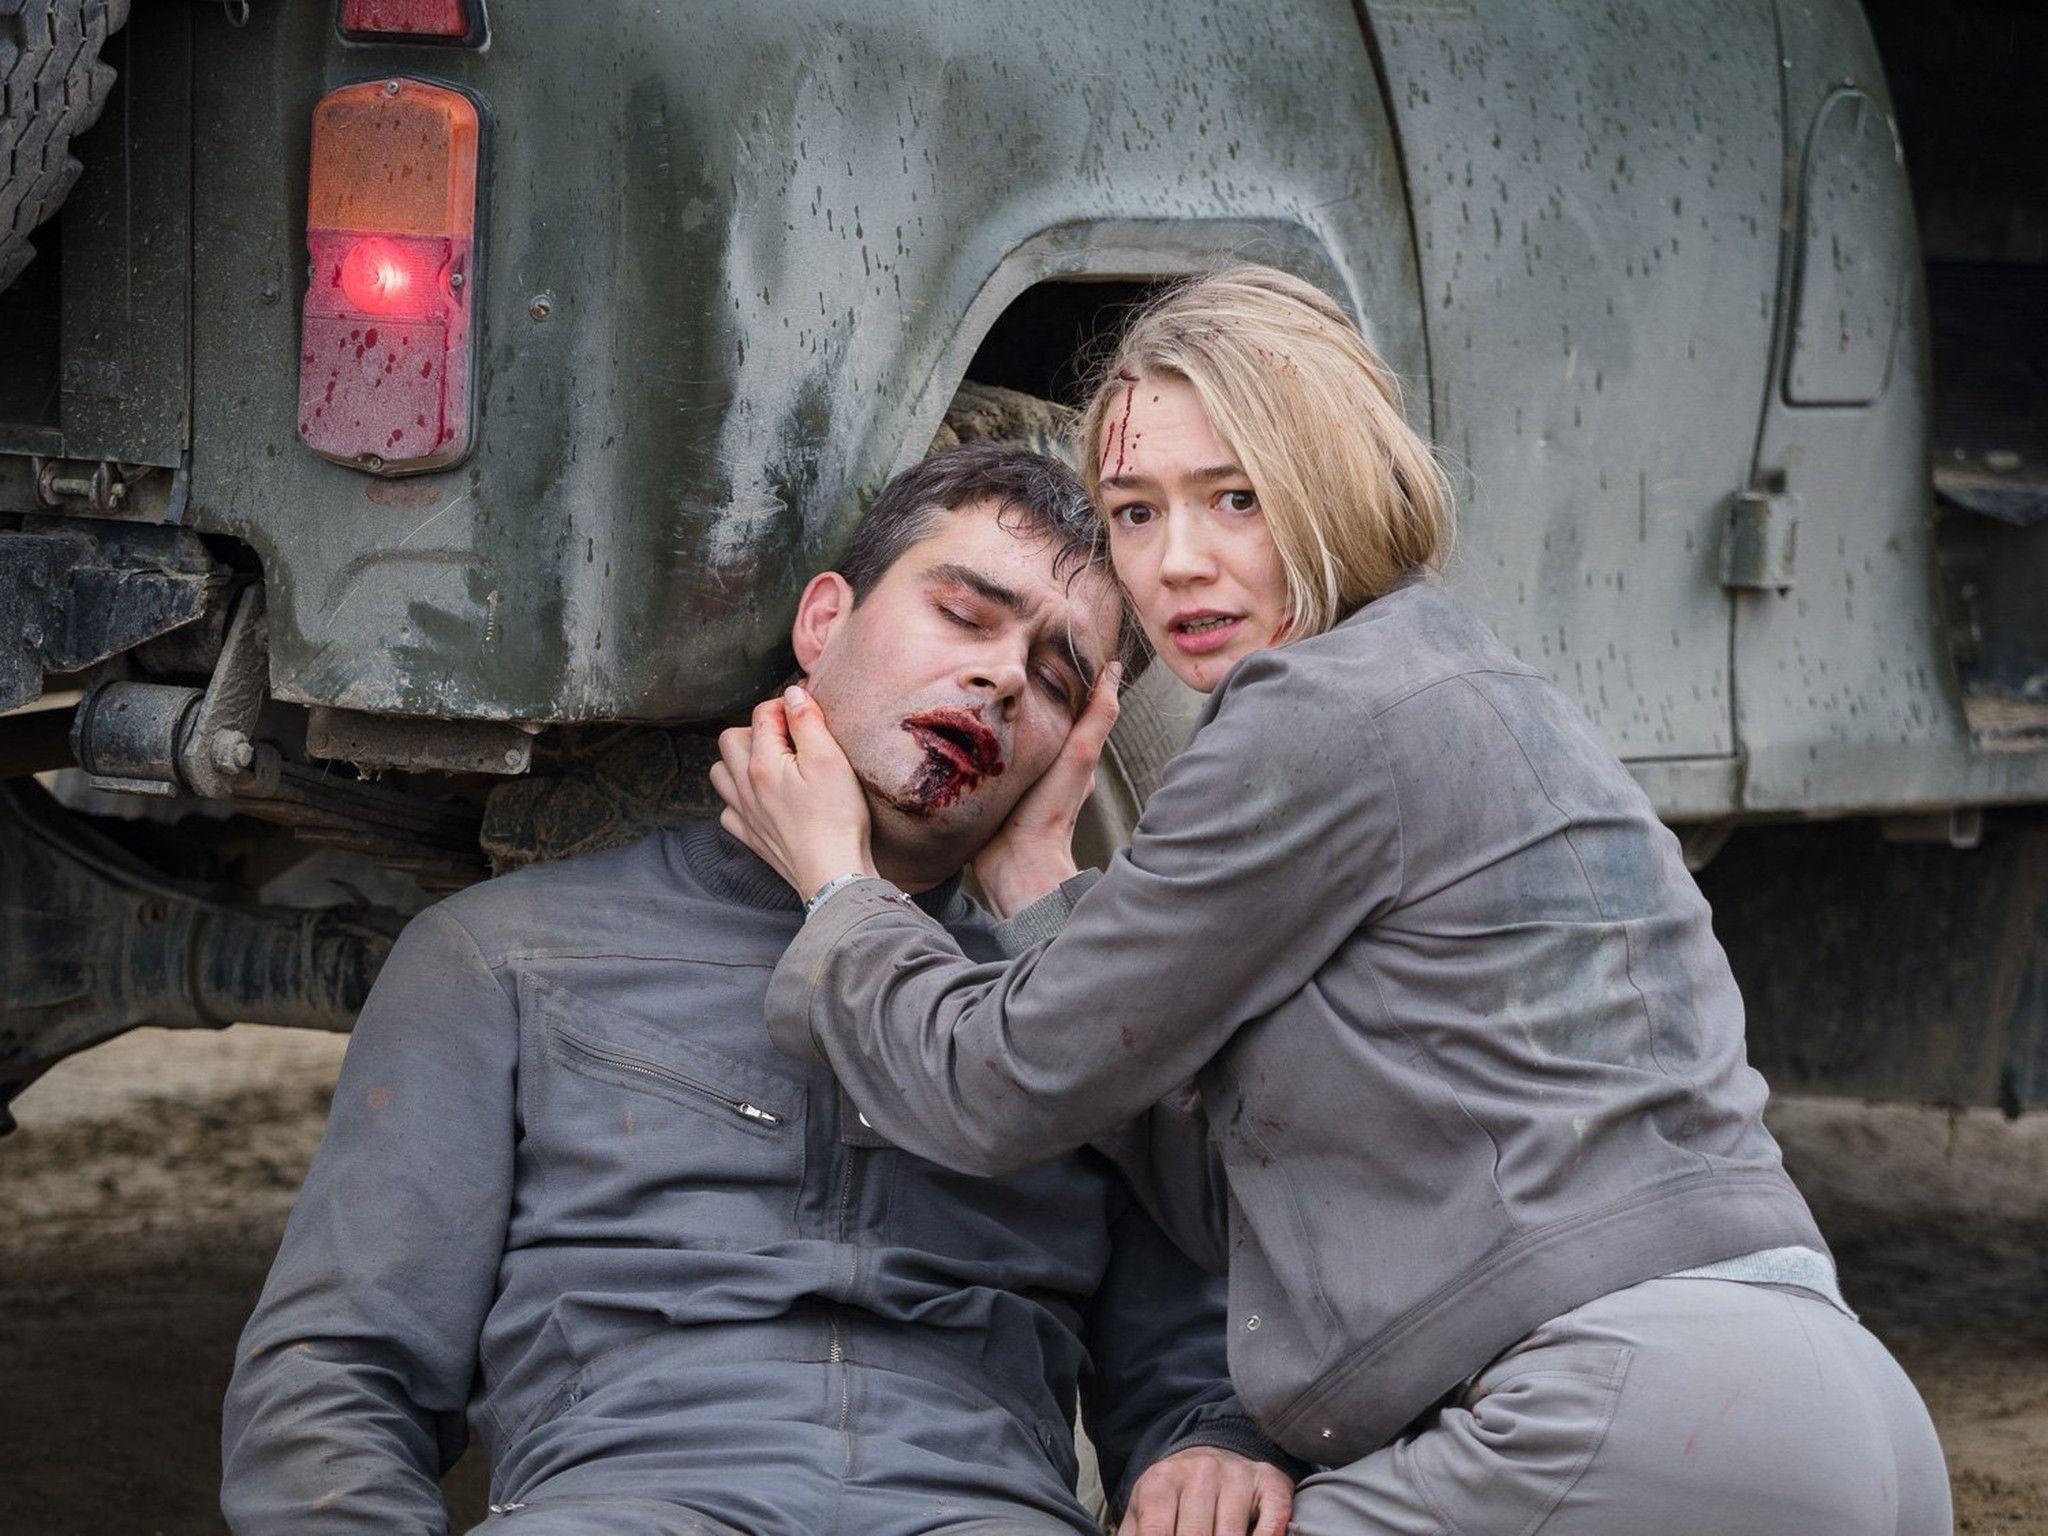 Oksana Akinshina e Pyotr Fyodorov